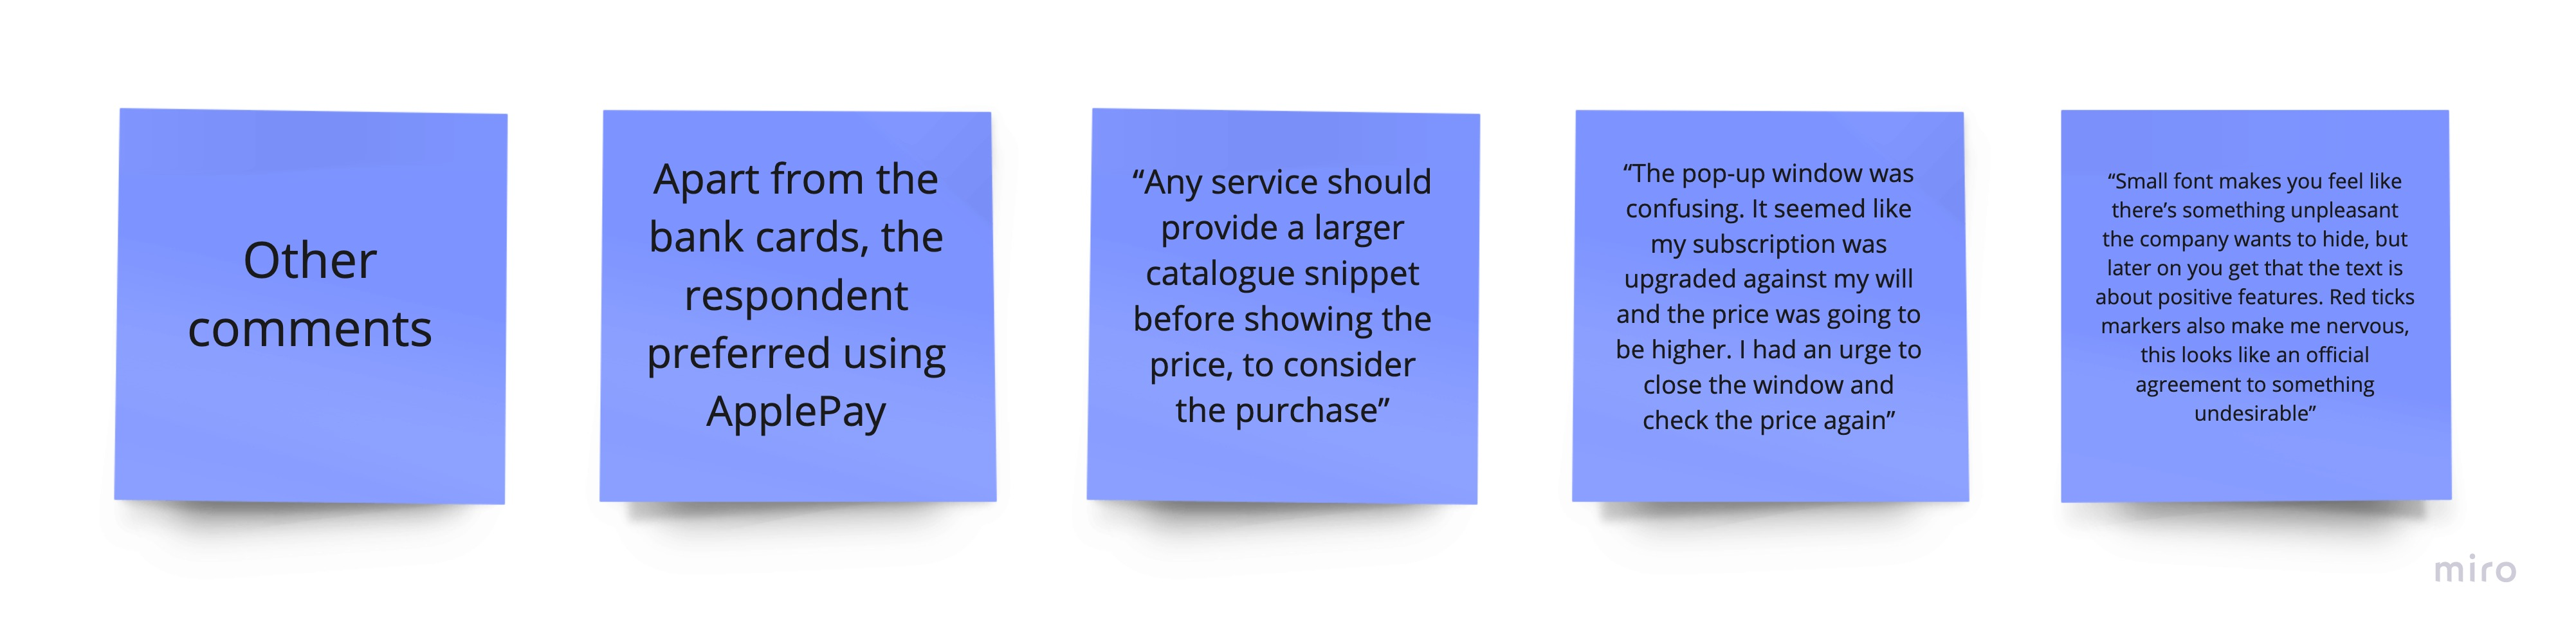 Per Aspera ad Cinema. Decomposing registration process in leading streaming services.